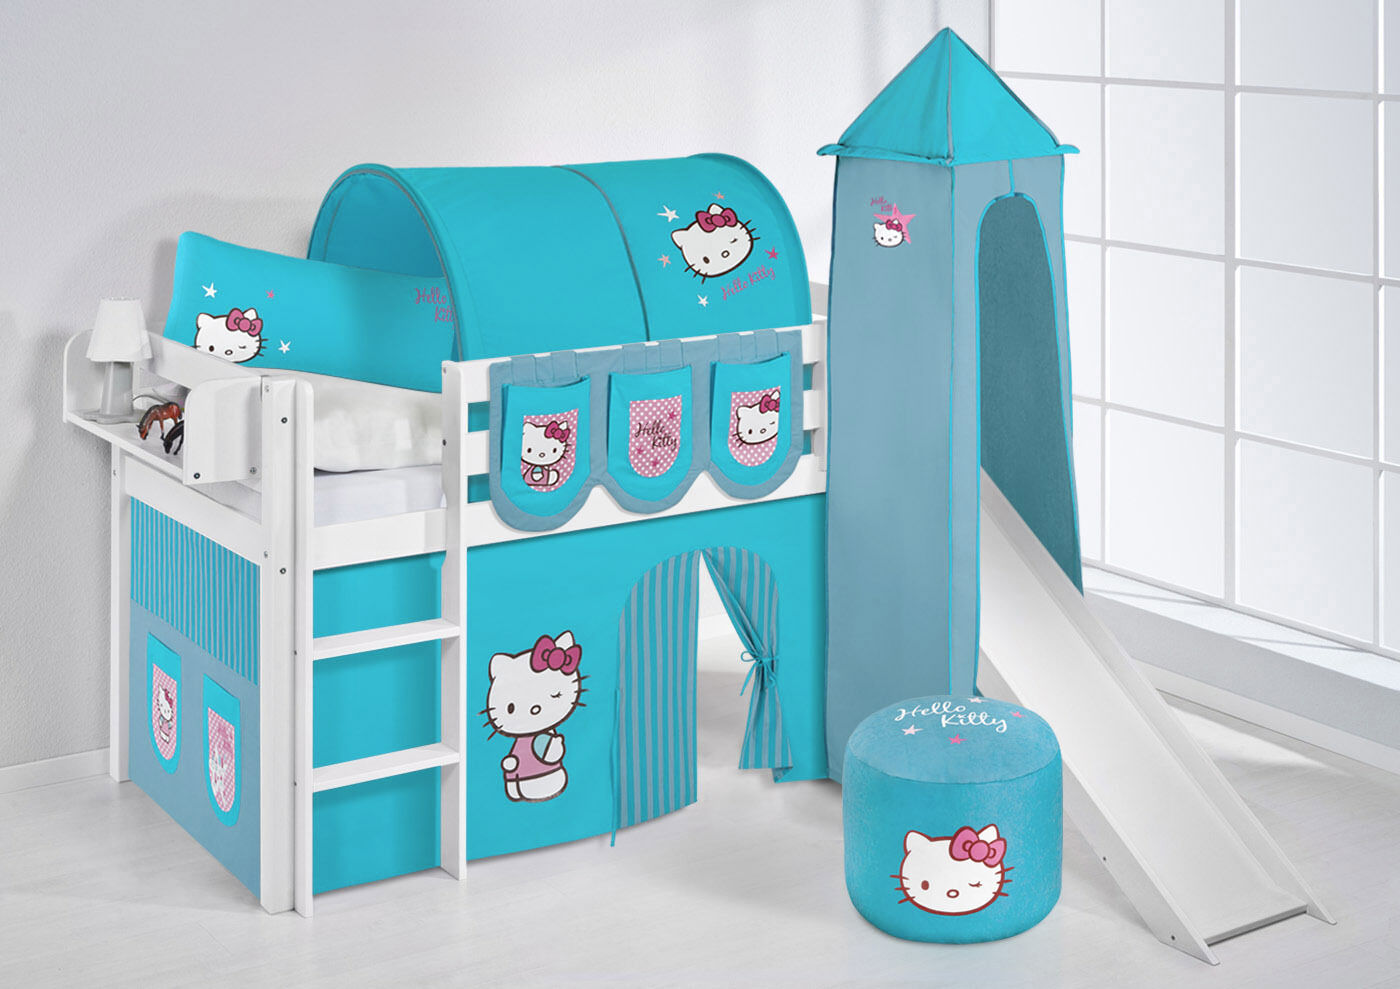 Lit Mezzanine de Lit Jelle Blanc avec Tour + Toboggan Enfants Lilo Hello Kitty